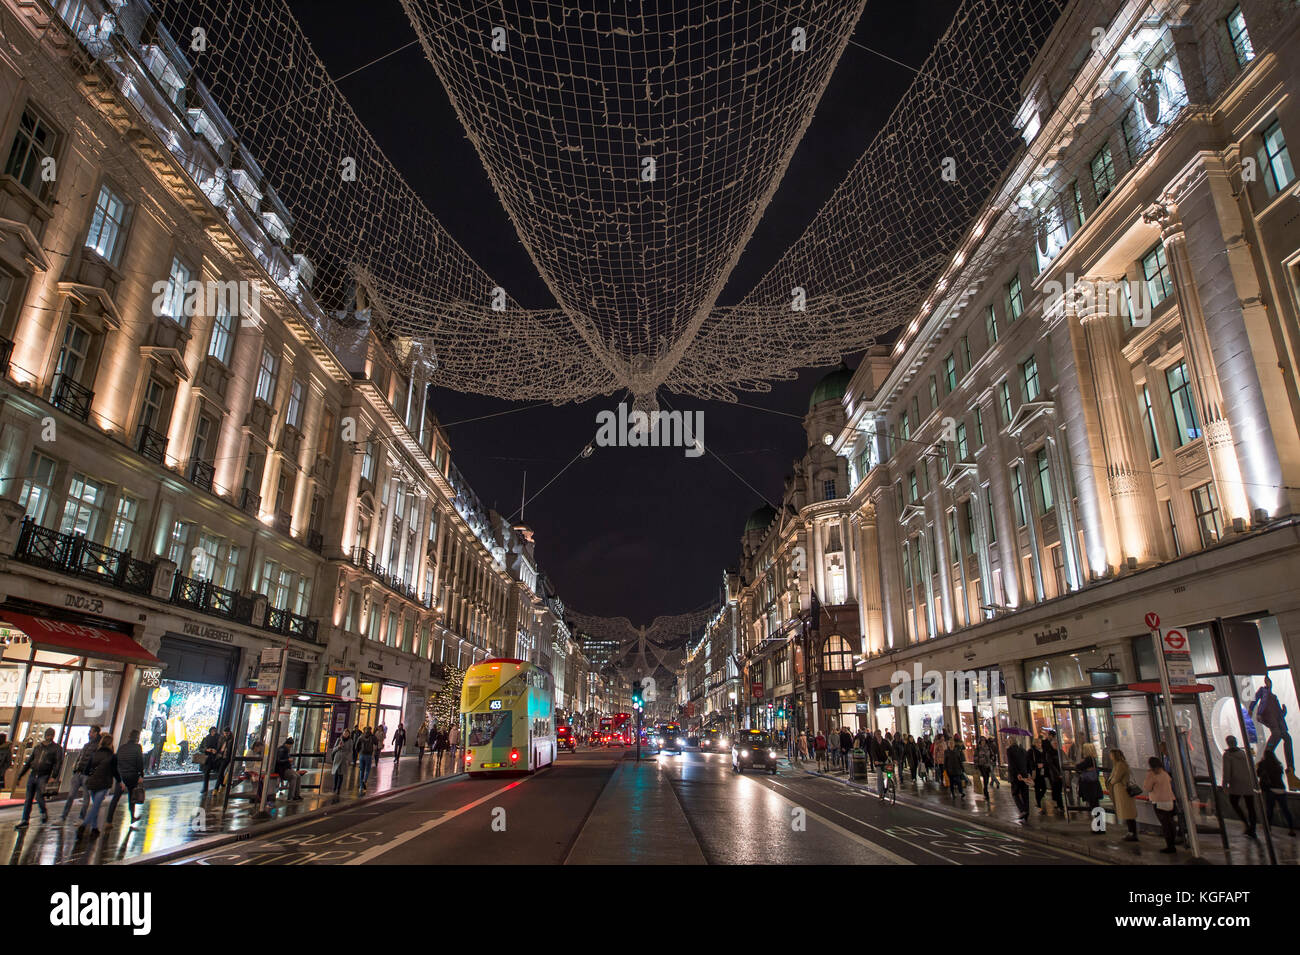 Regent Street, London, UK. 7 November, 2017. The West End's premier shopping street gets ready for Christmas, Regent - Stock Image